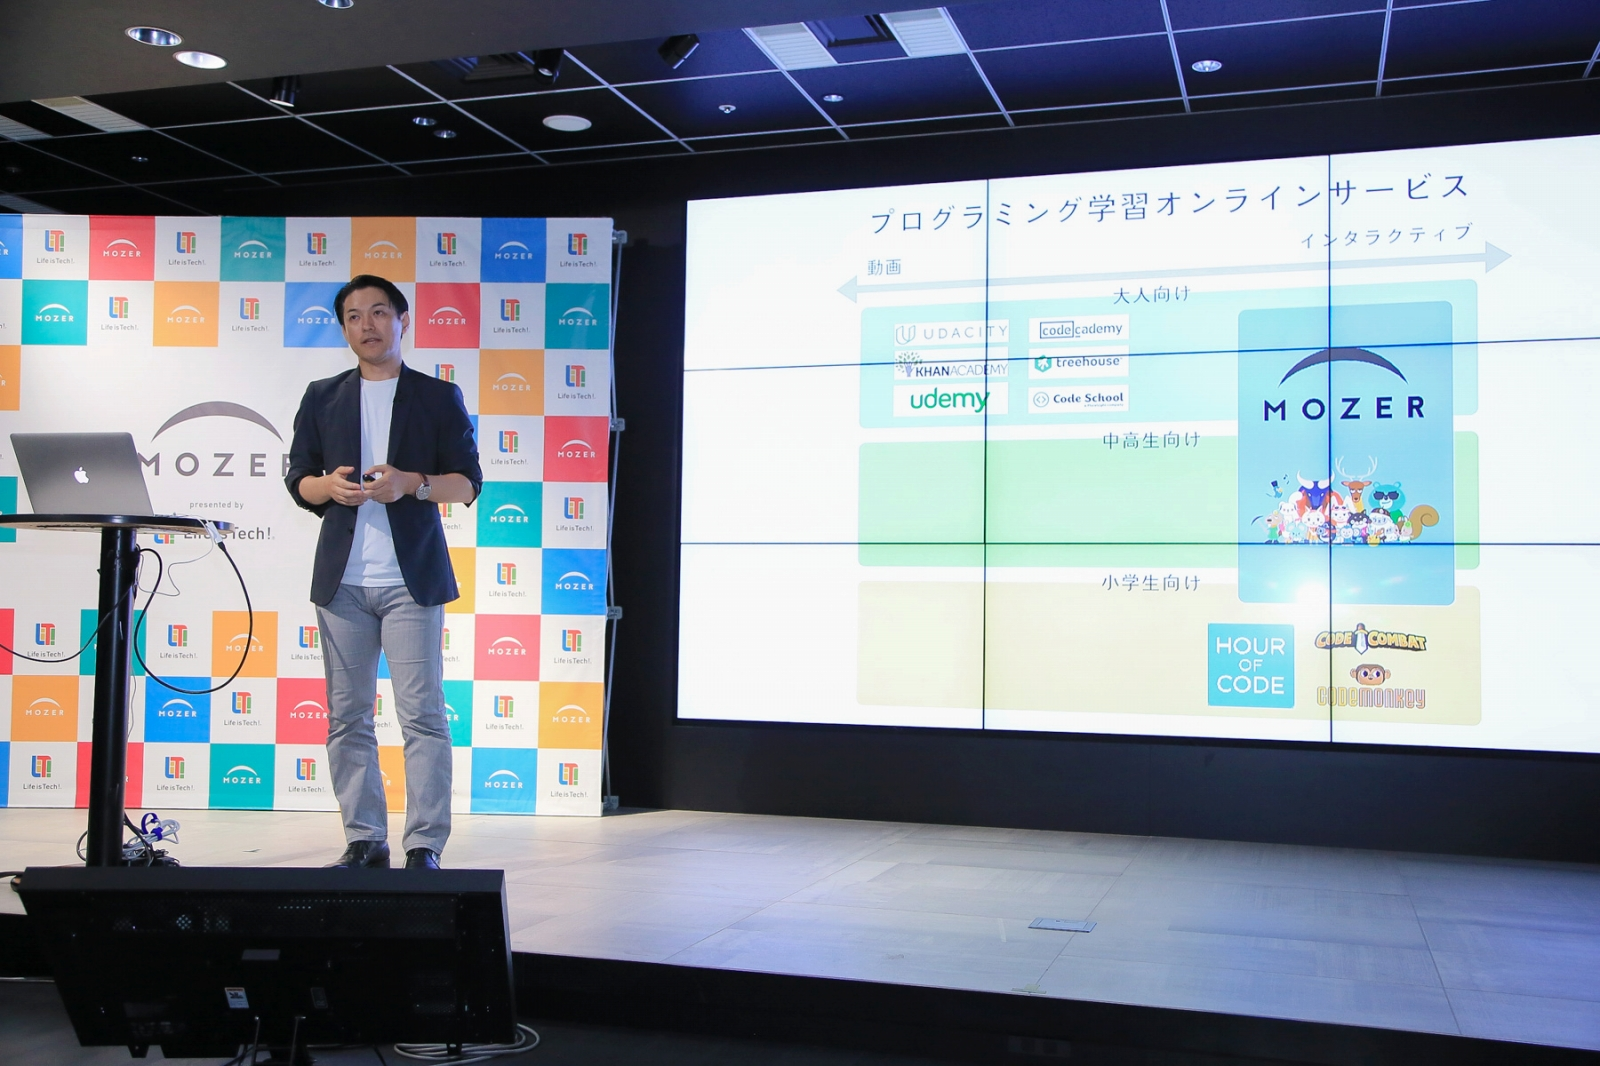 「MOZER」の立ち位置を説明するライフイズテック株式会社取締役CTOの橋本善久氏